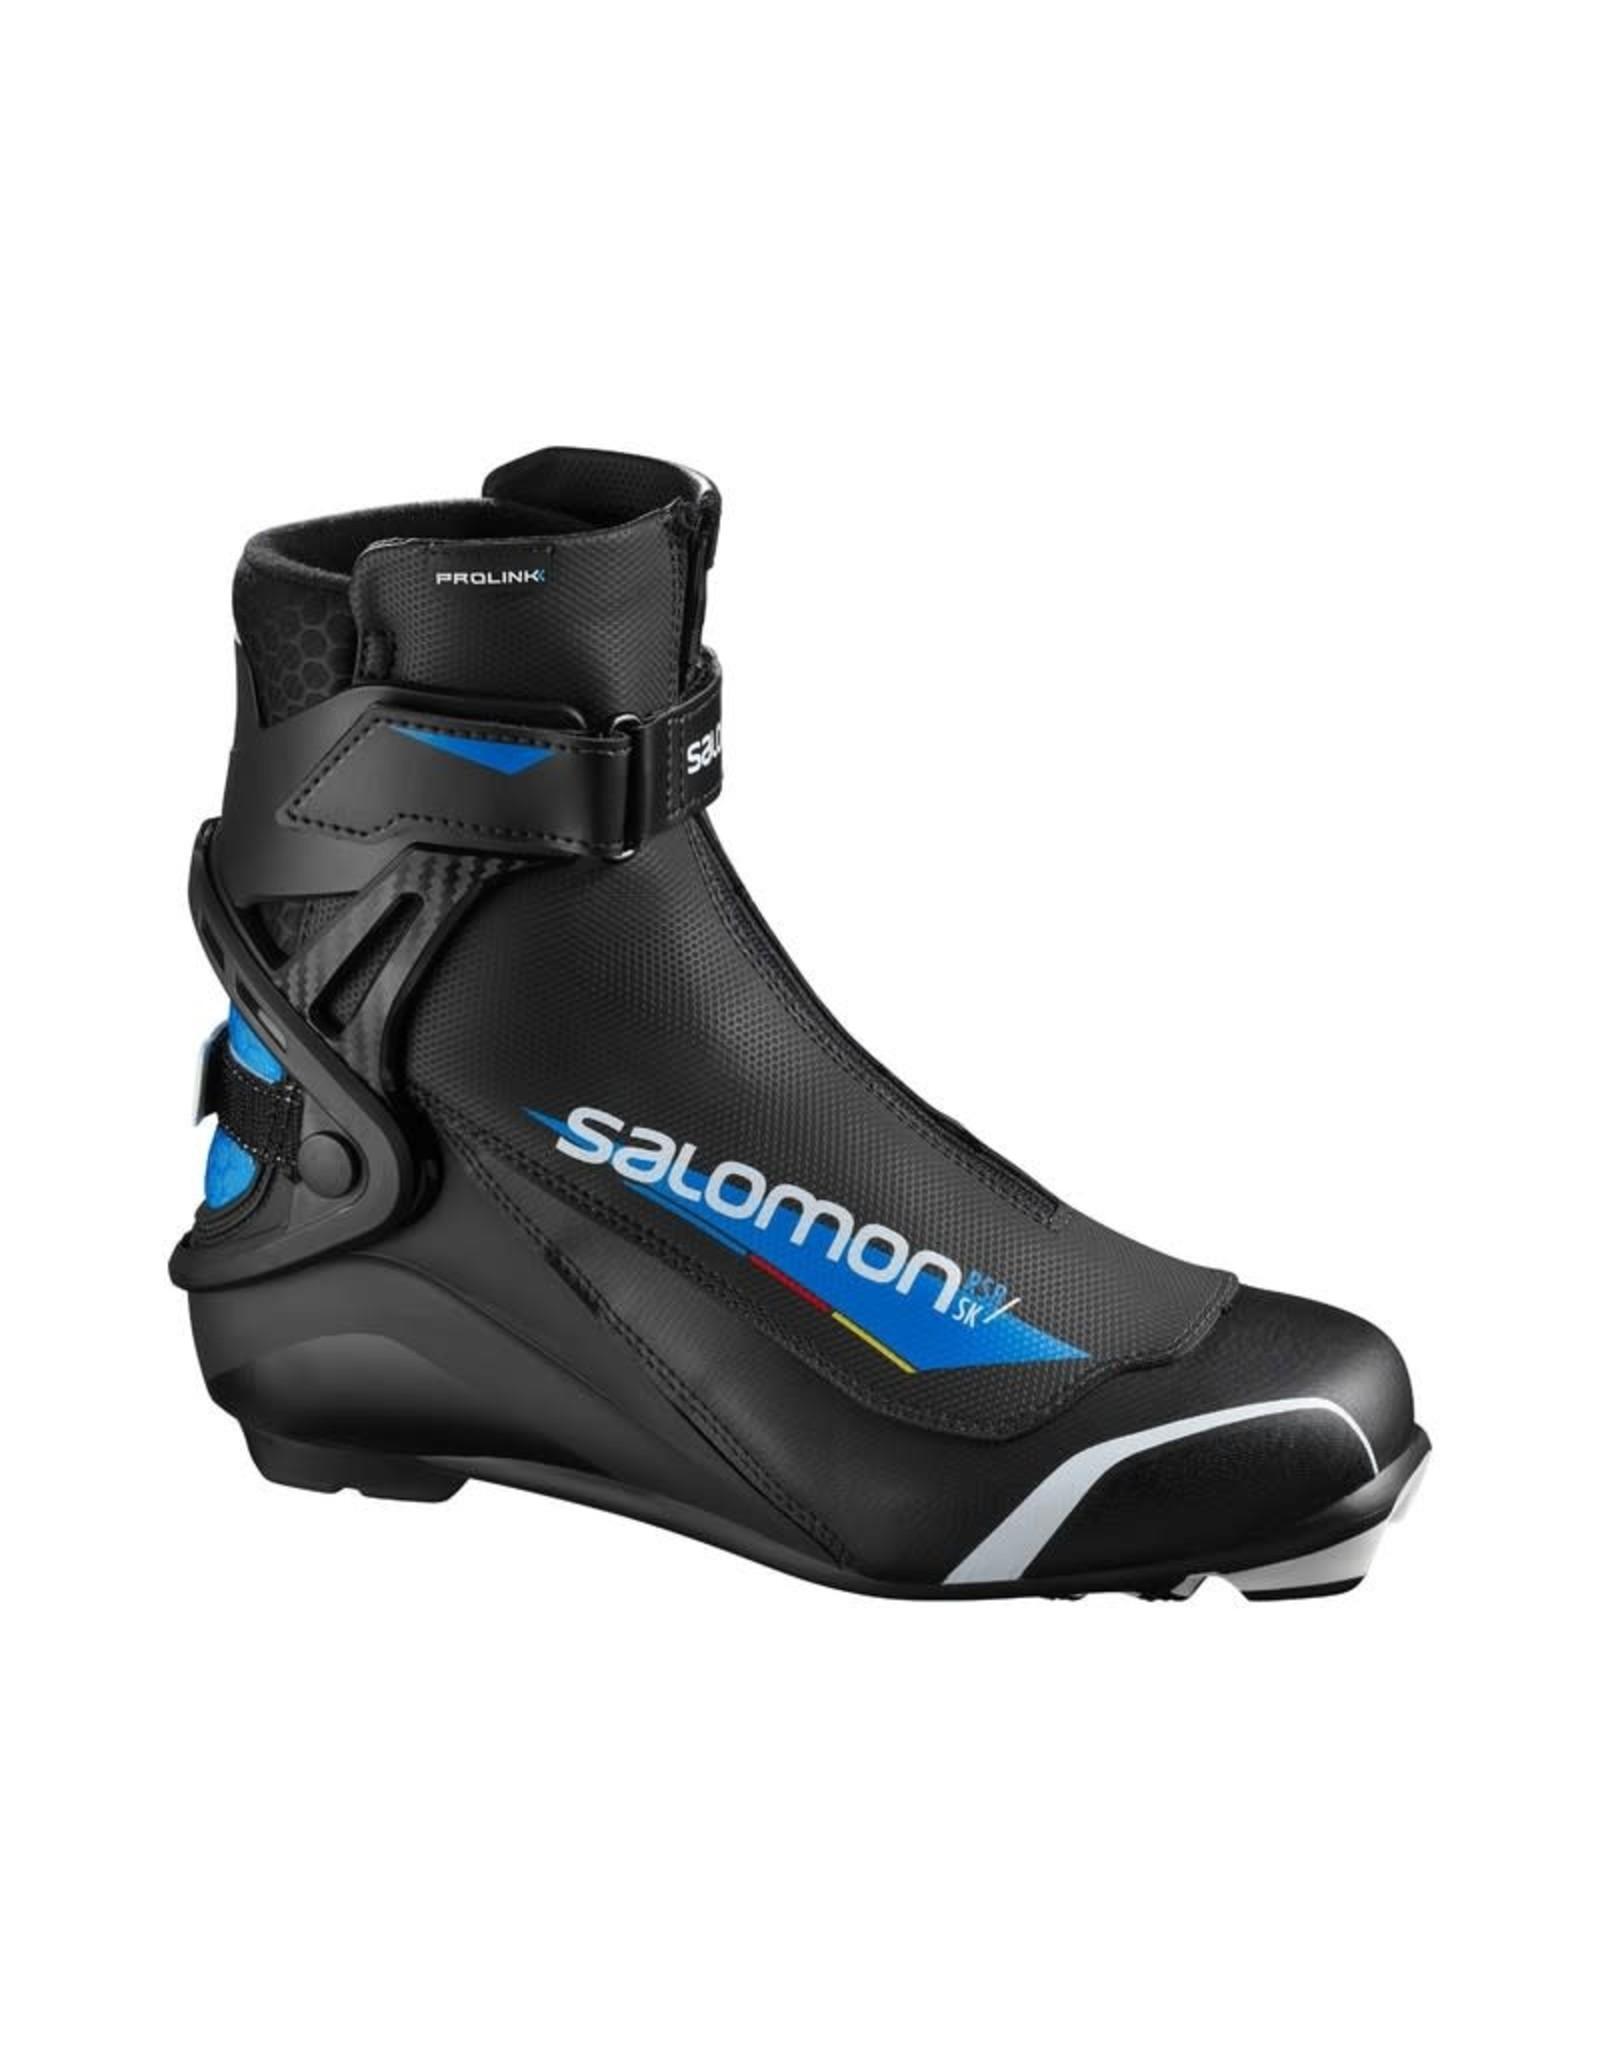 SALOMON '21, Salomon, Boot, RS8 Prolink